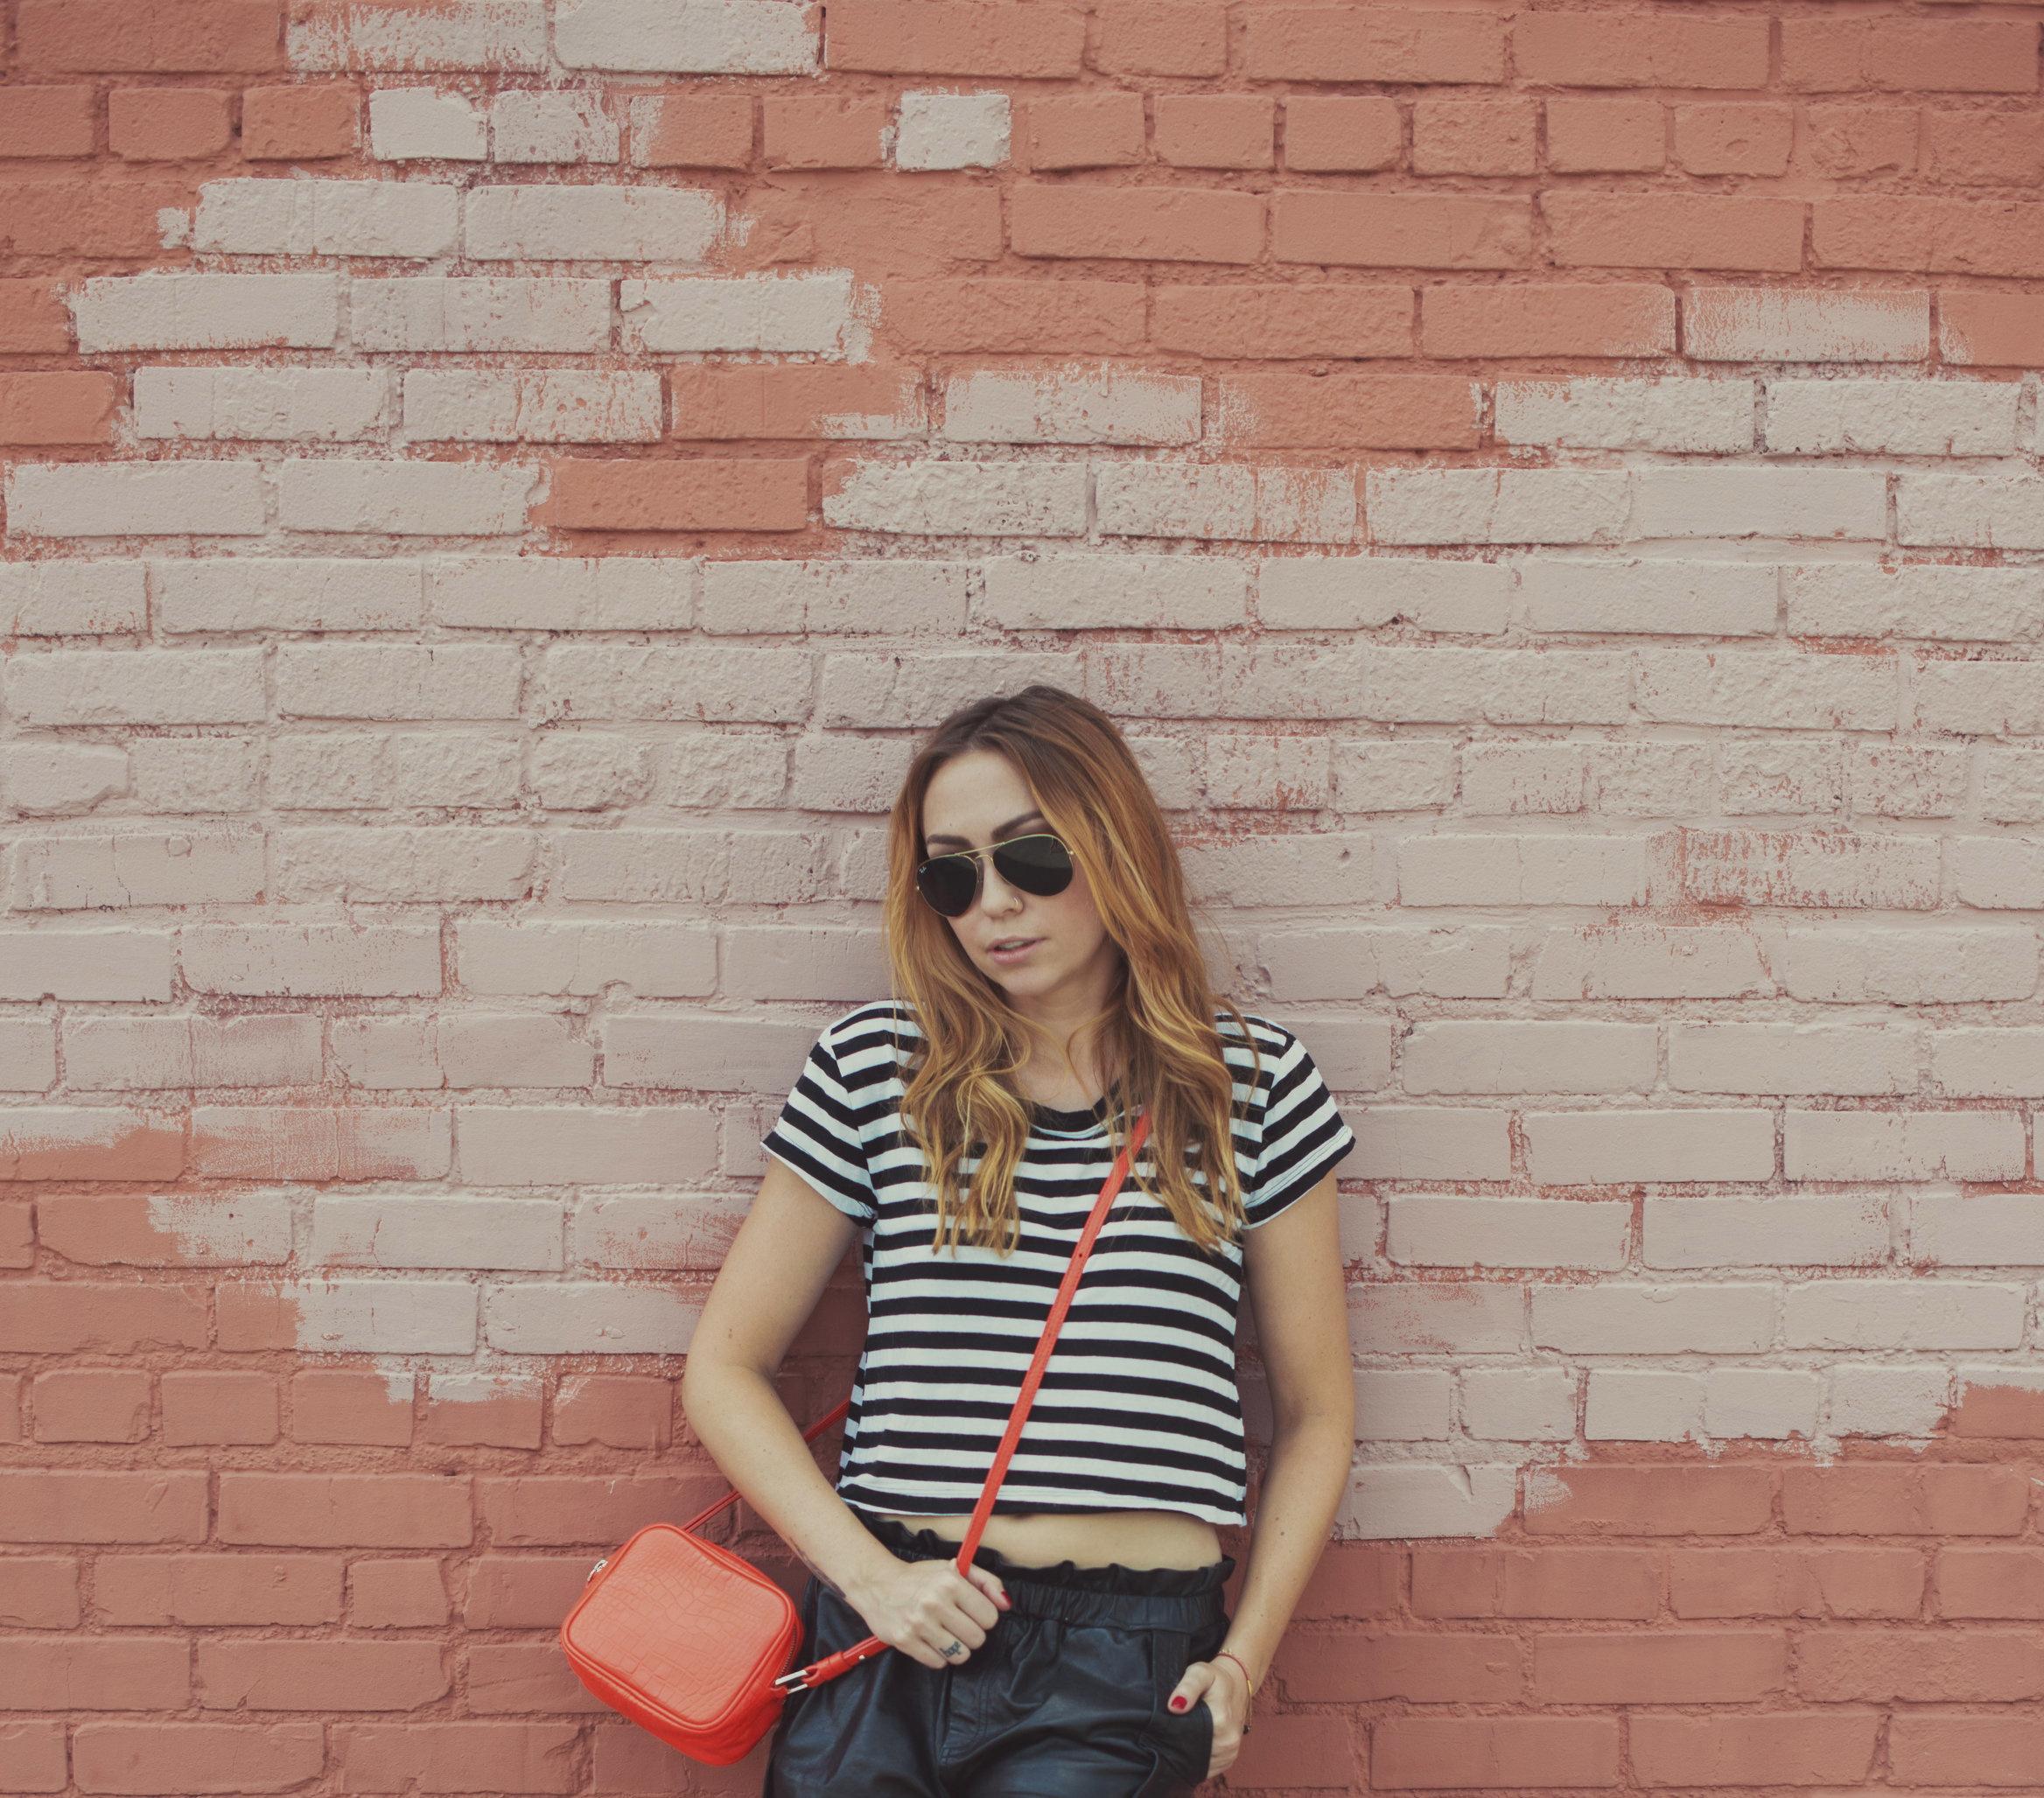 Tshirt - NastyGal | Shorts - Rebecca Minkoff | Bag - RoviMoss | Sneaks - Saint Laurent || photos by Blythe Thomas